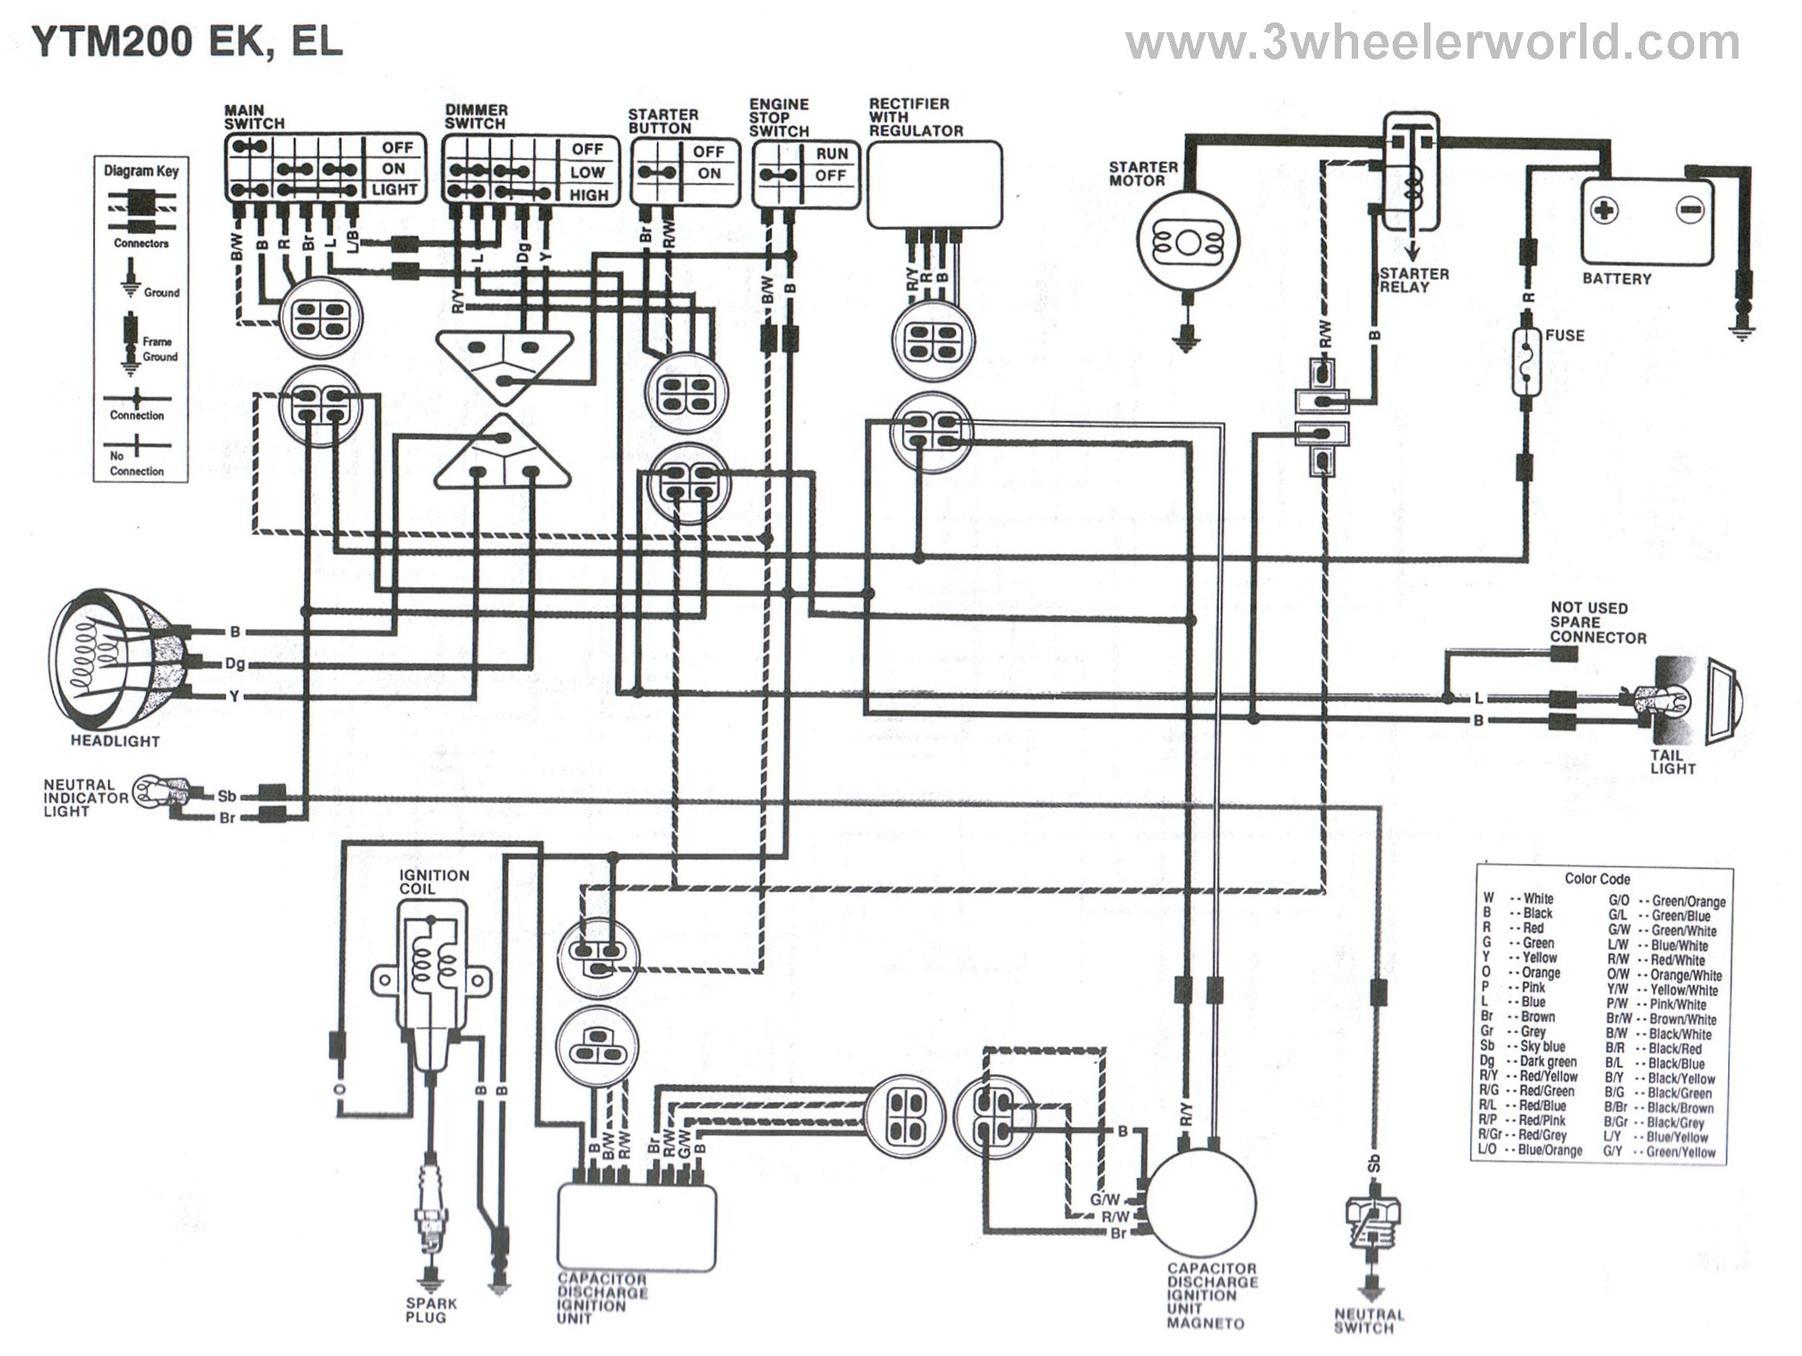 1965 Mercury 650 Wiring Diagram Chevrolet Equinox Fuse Box ... on cdi ignition wiring diagram, yamaha r6 wiring-diagram, suzuki intruder 1400 wiring diagram, yamaha motorcycle wiring diagrams, triumph bonneville wiring diagram, triumph speed triple wiring diagram, 4 post solenoid wiring diagram, club car wiring diagram, victory hammer wiring diagram, yamaha raider parts diagram, chopper wiring diagram, victory cross country wiring diagram, yamaha rhino wiring-diagram, kawasaki wiring diagram, yamaha warrior wiring-diagram, yamaha banshee wiring-diagram, triumph america wiring diagram, suzuki m50 wiring diagram, triumph thunderbird wiring diagram, honda wiring diagram,